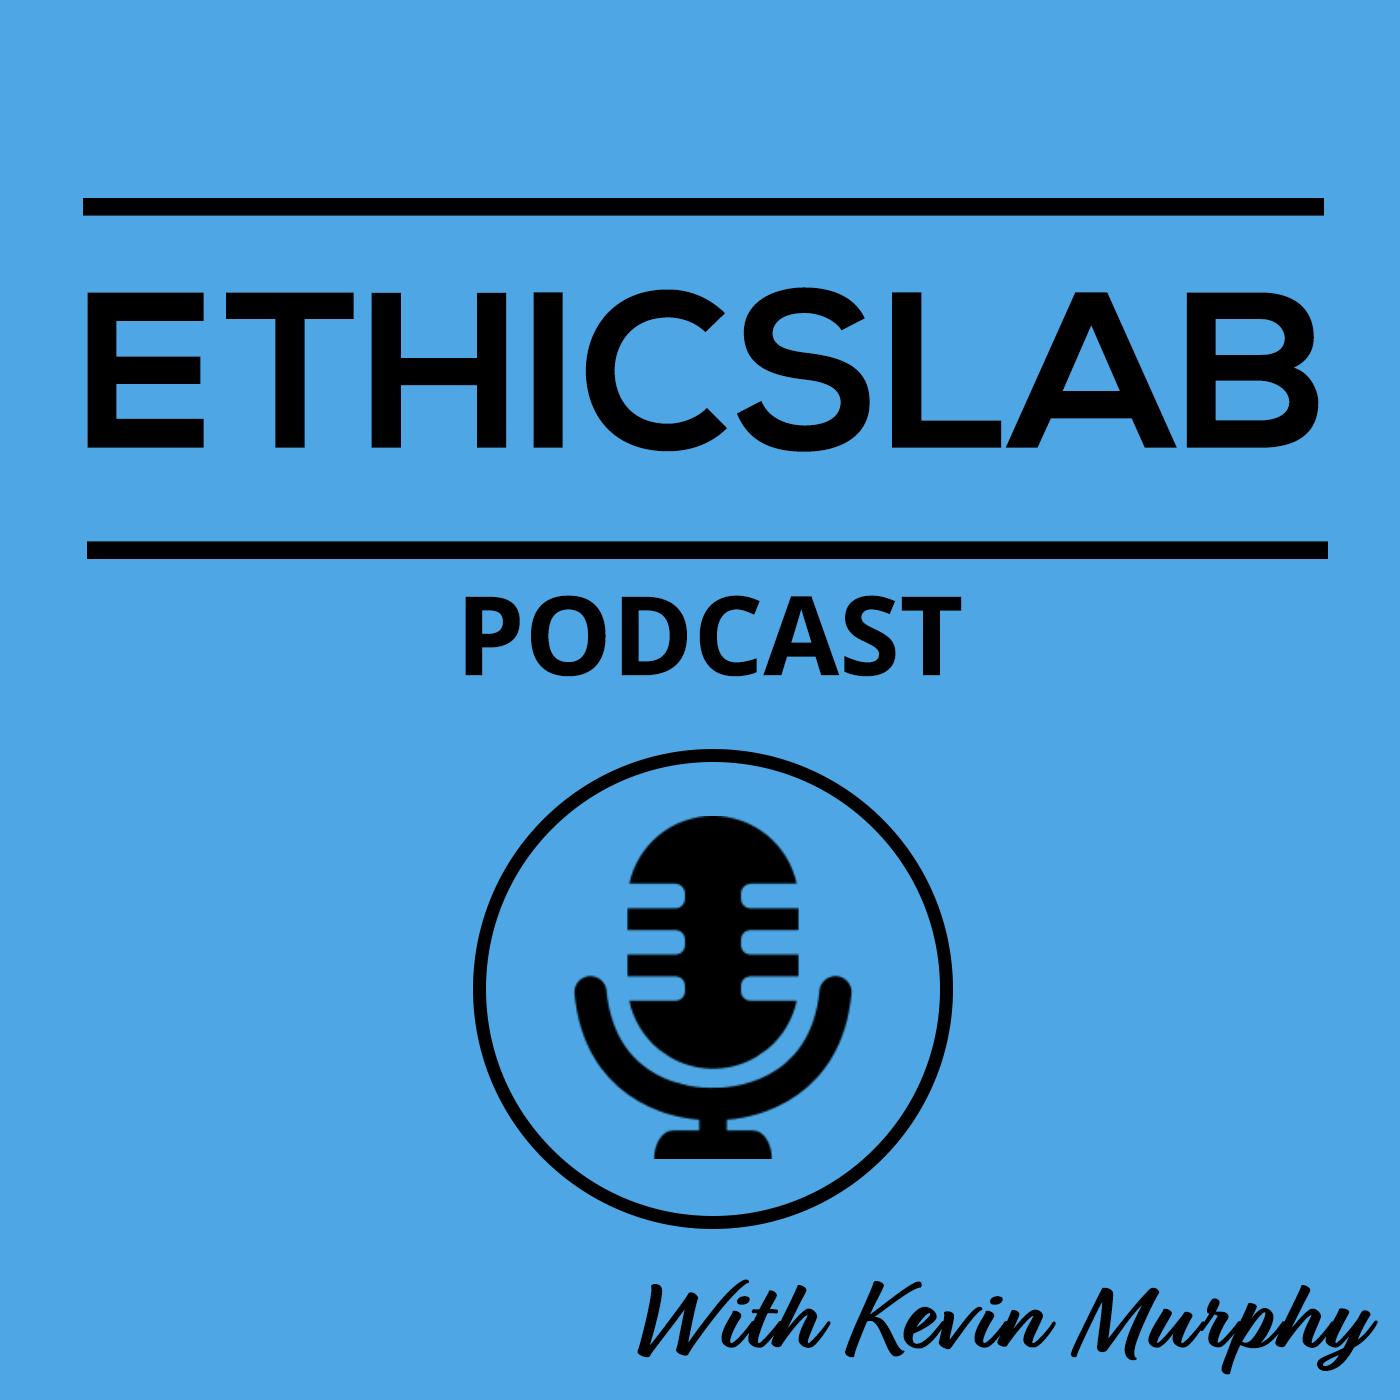 EthicsLab